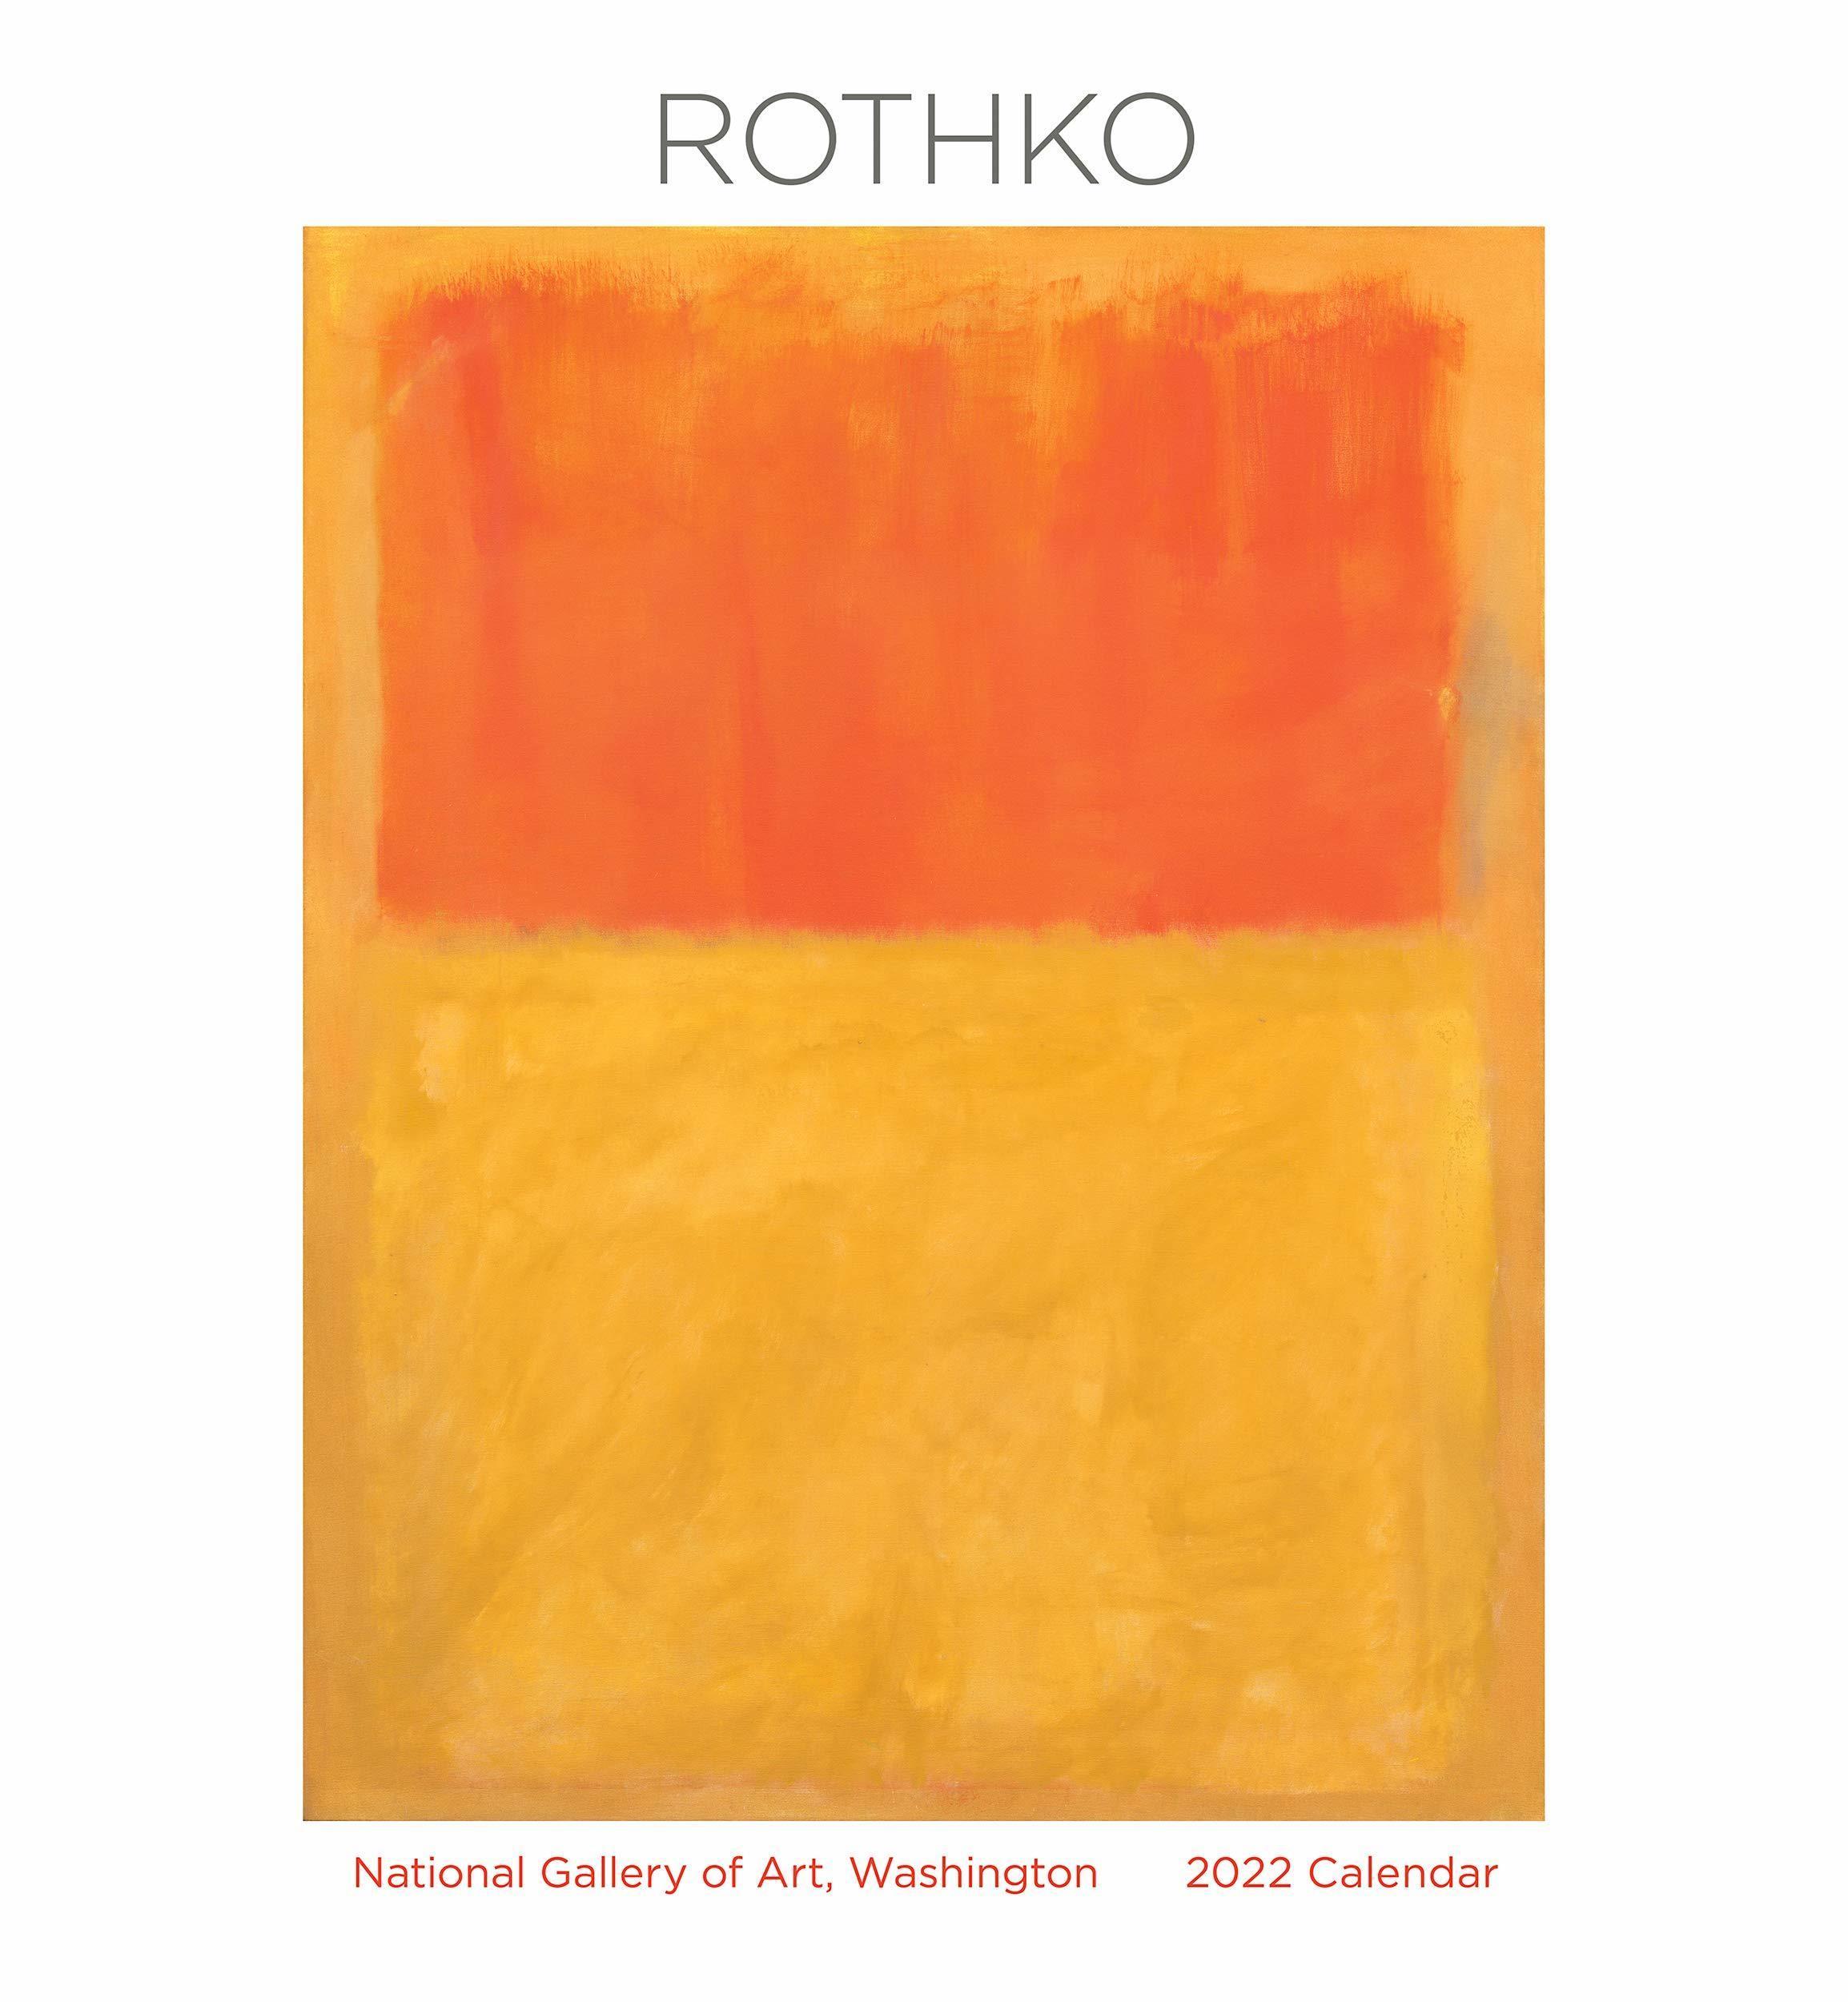 Rothko 2022 Calendar